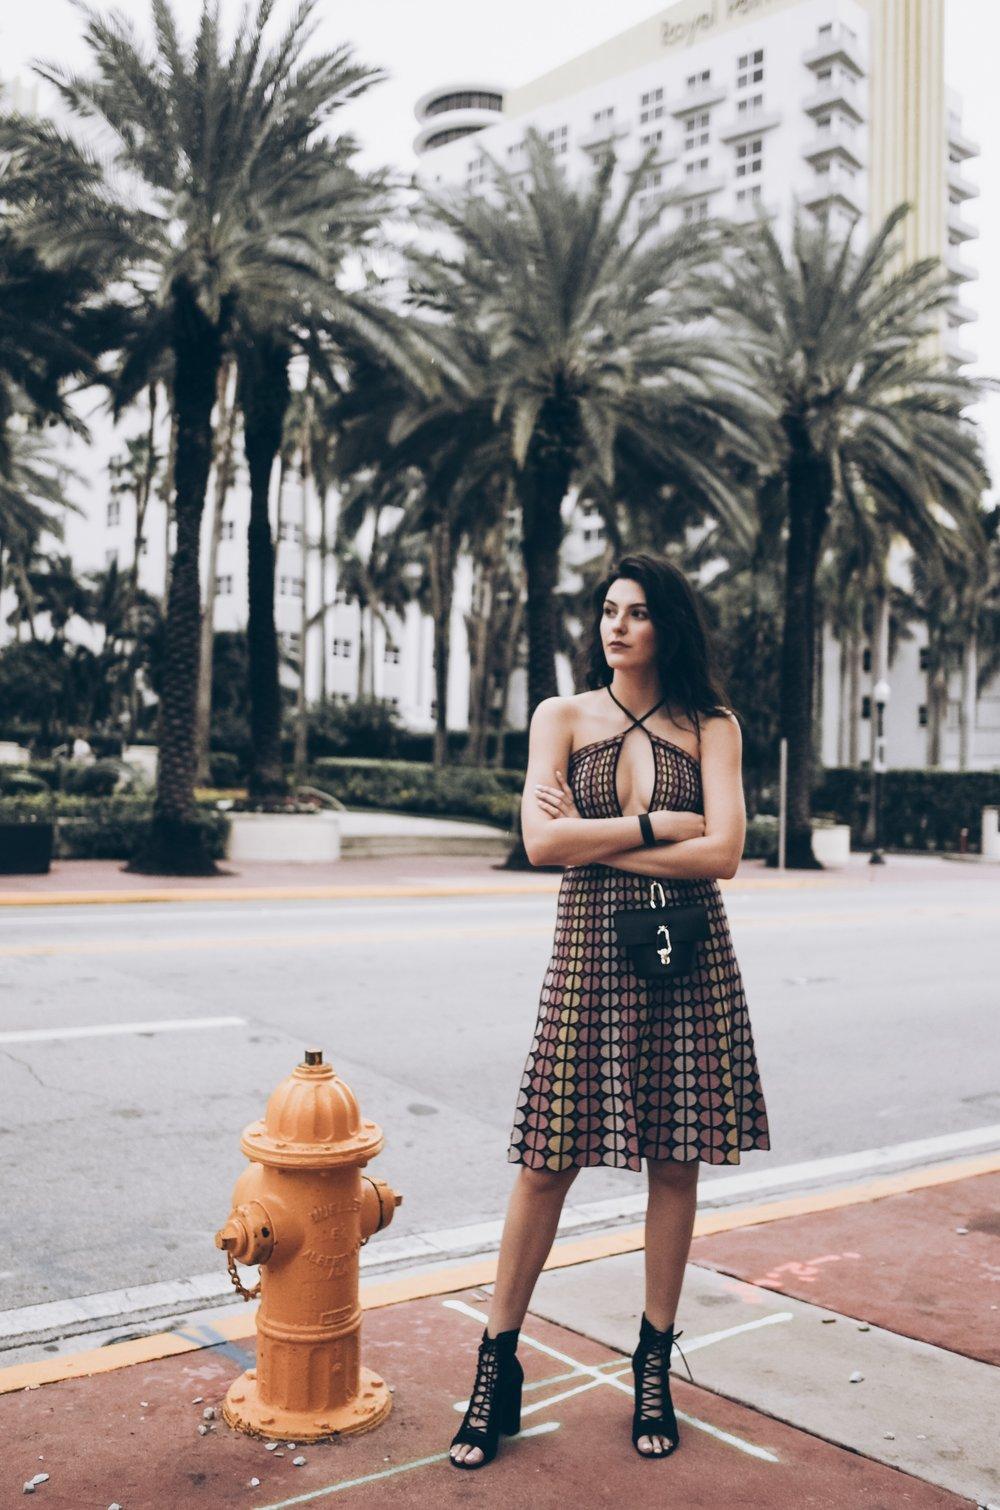 Miami Art Basel by Julia Friedman - wearing M Missoni Dress.